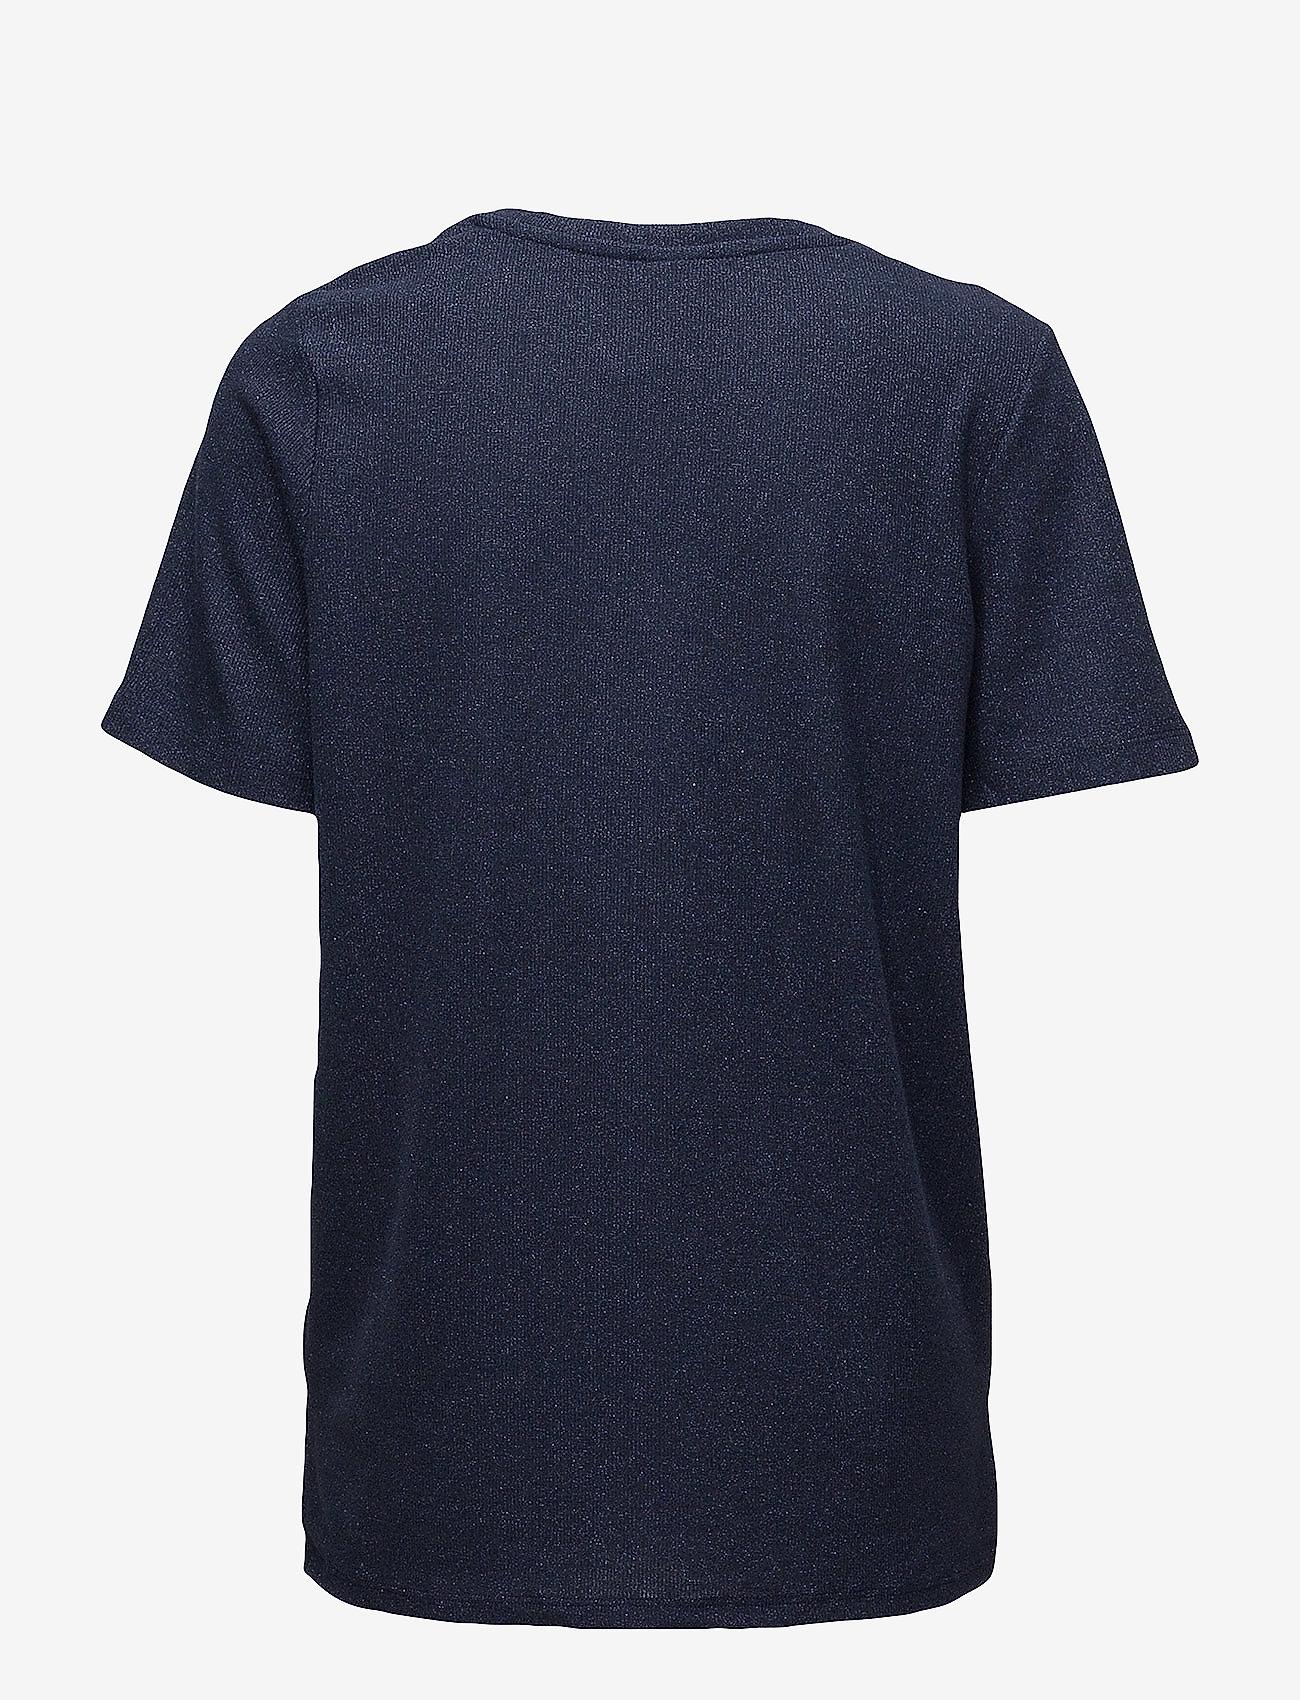 Saint Tropez - SHIMMER KNIT TOP W. SLITS - t-shirts - m.indigo